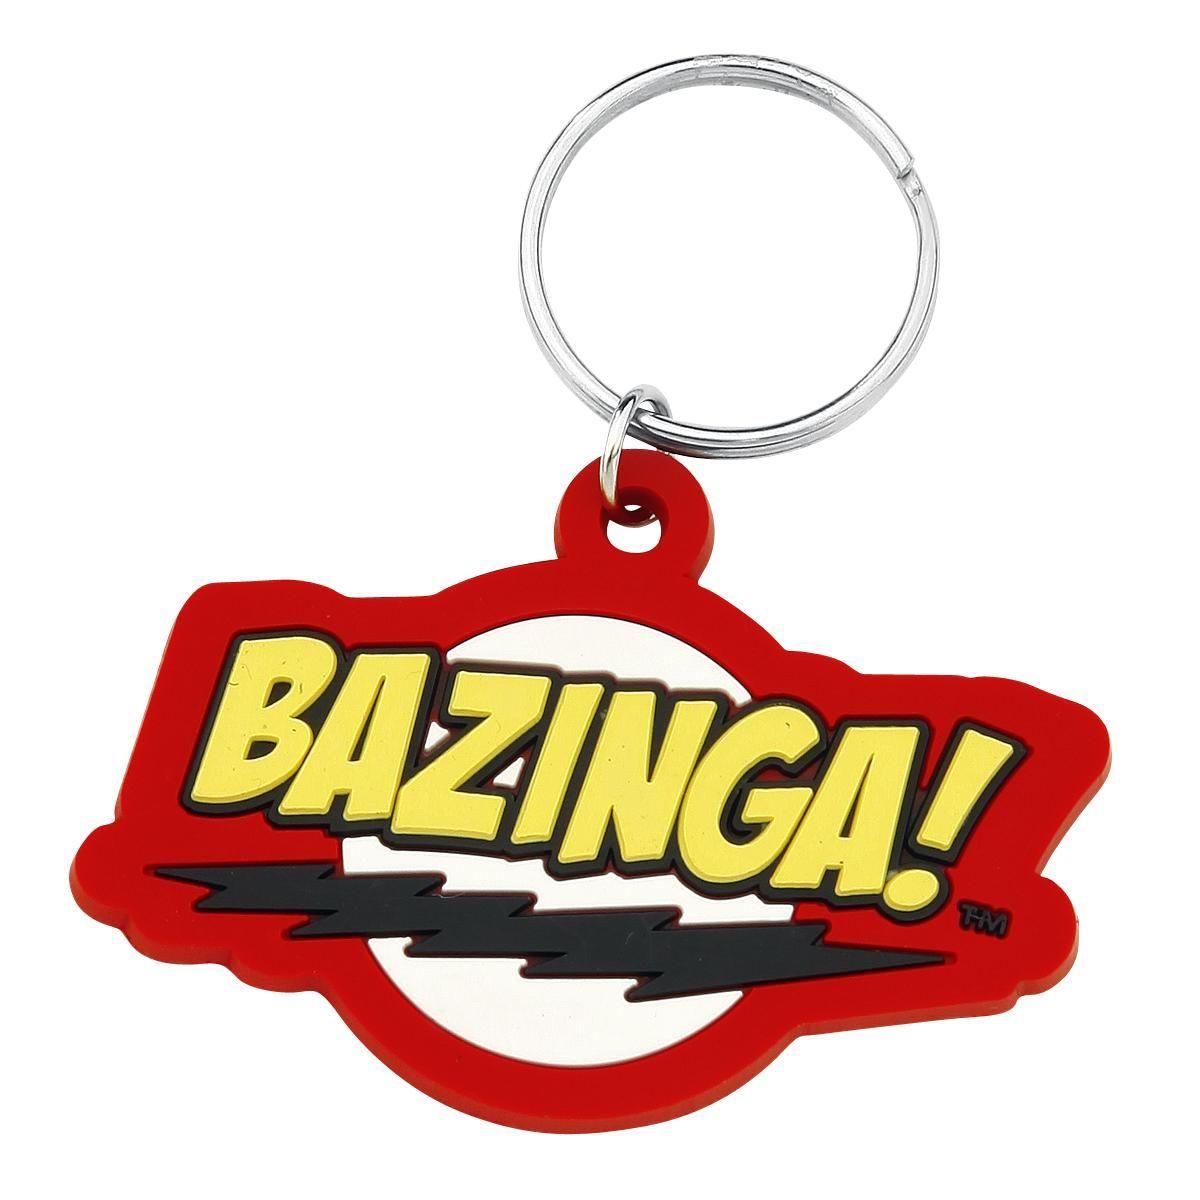 Portachiavi #TheBigBangTheory con logo Bazinga in gomma. Dimensioni: 6 x 4,5 cm circa.